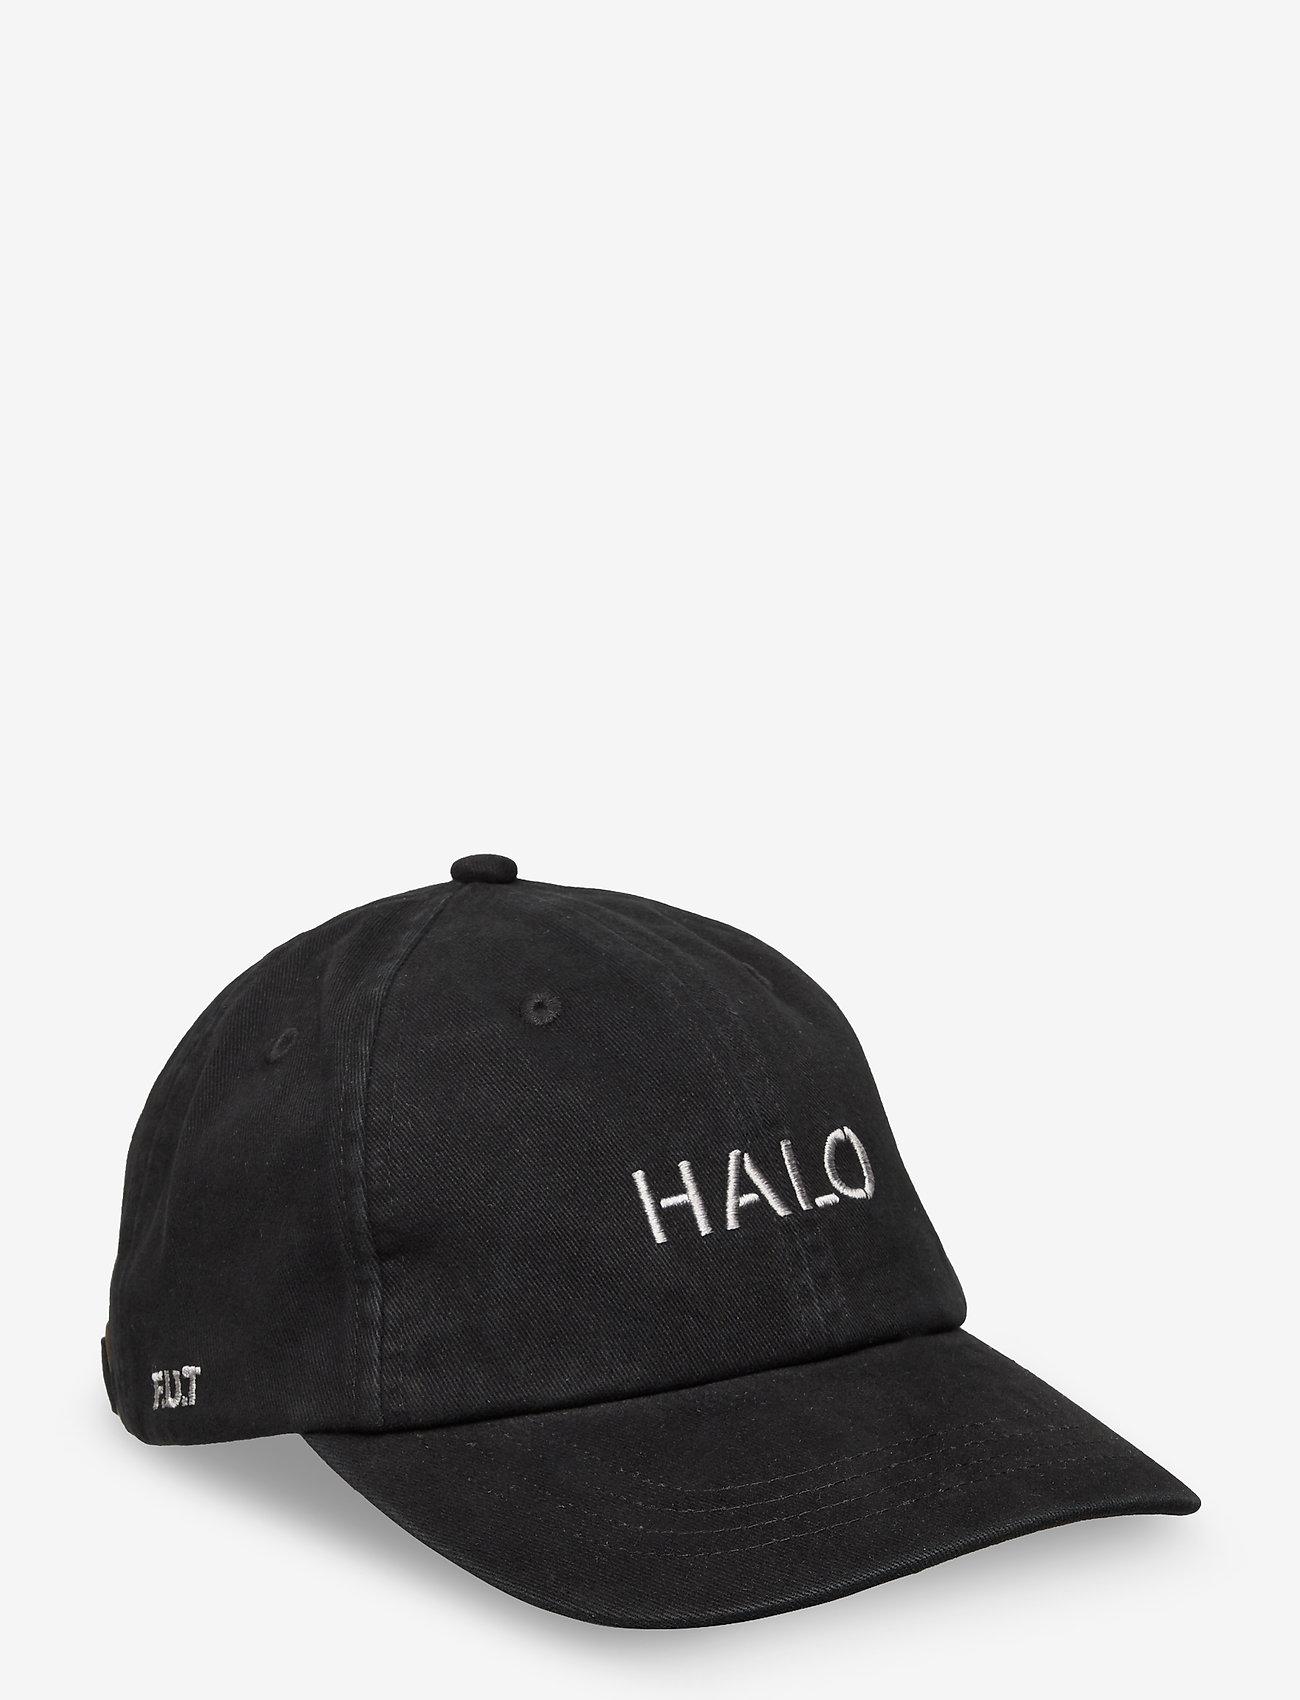 HALO - HALO CAP - caps - black - 0